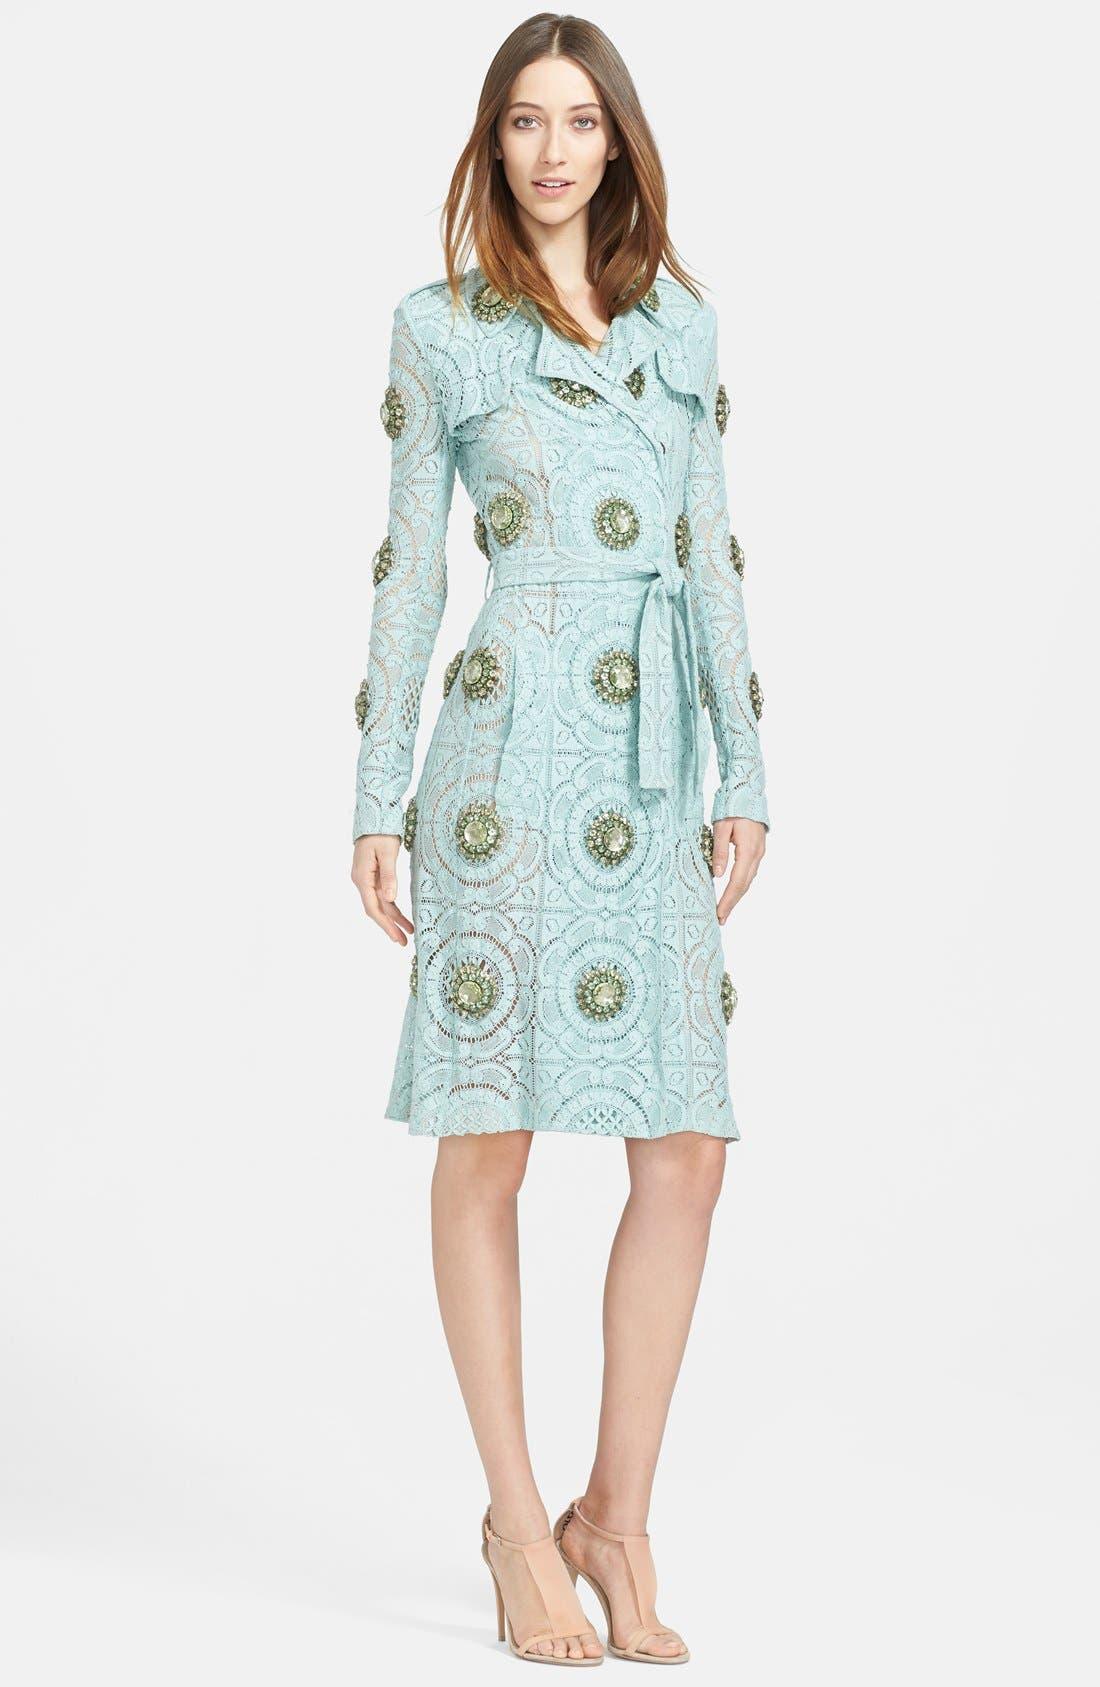 Main Image - Burberry Prorsum Embellished English Lace Trench Coat